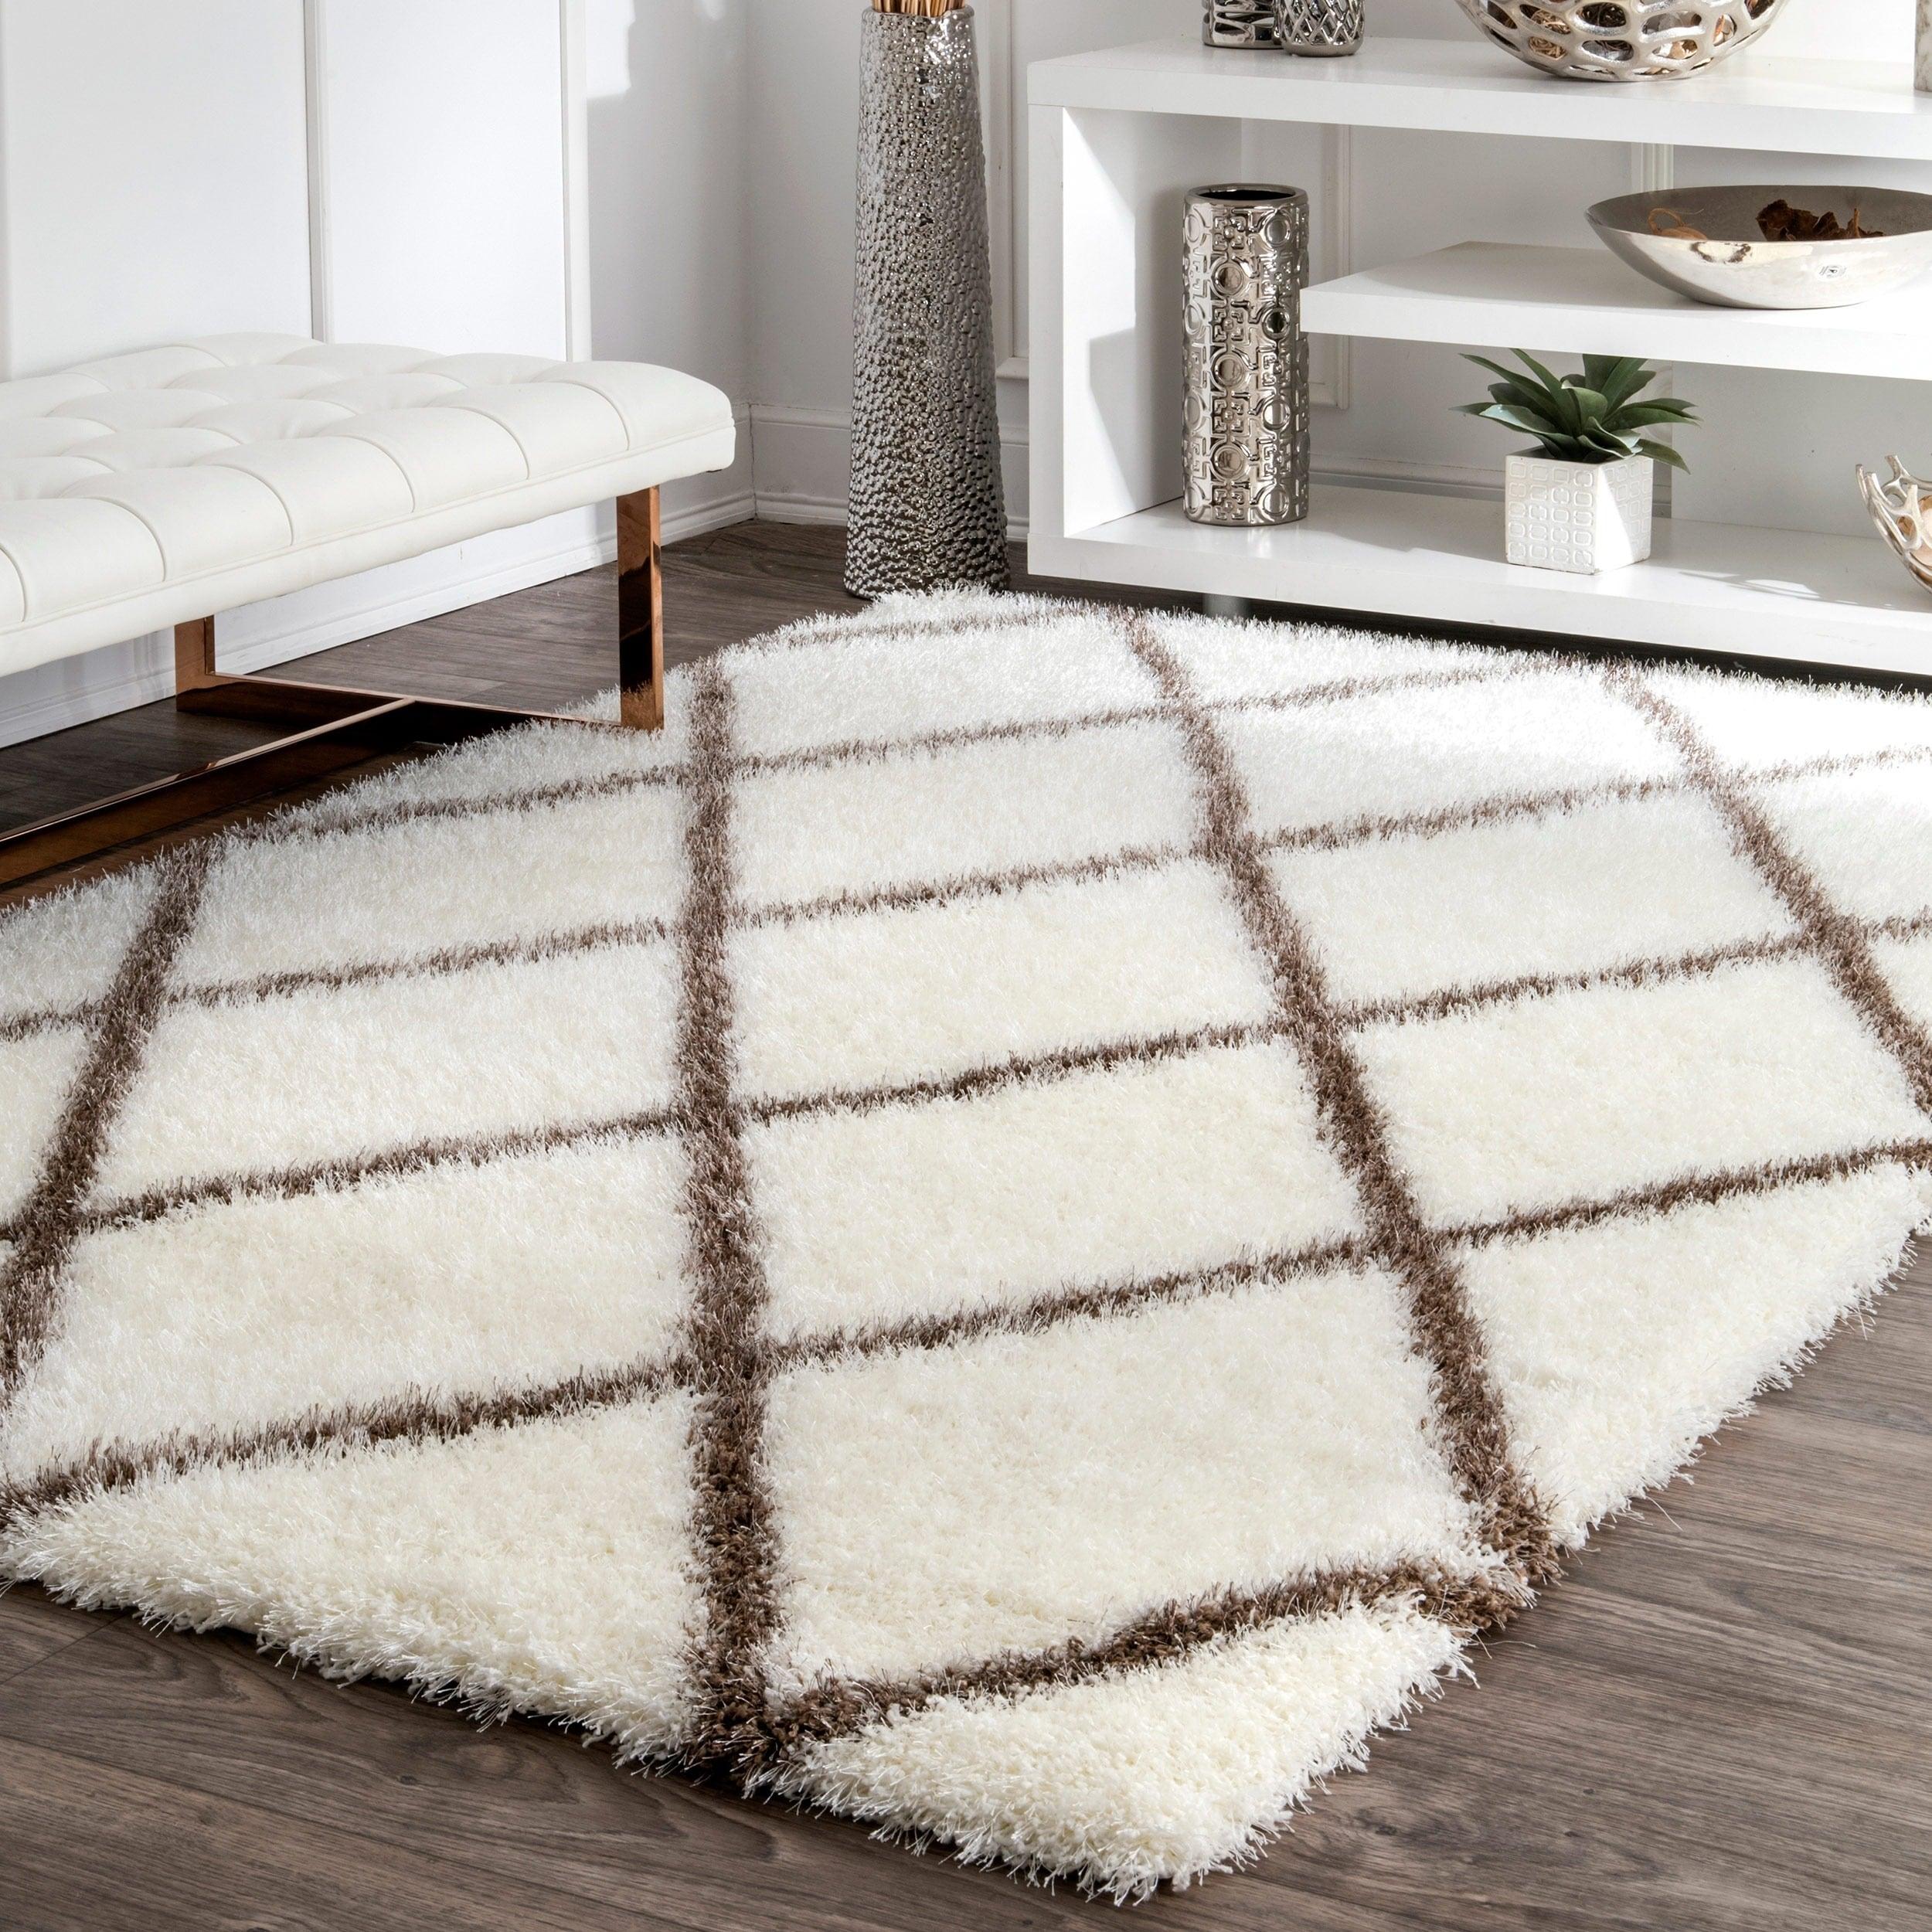 Nuloom Soft And Plush Moroccan Trellis Rug